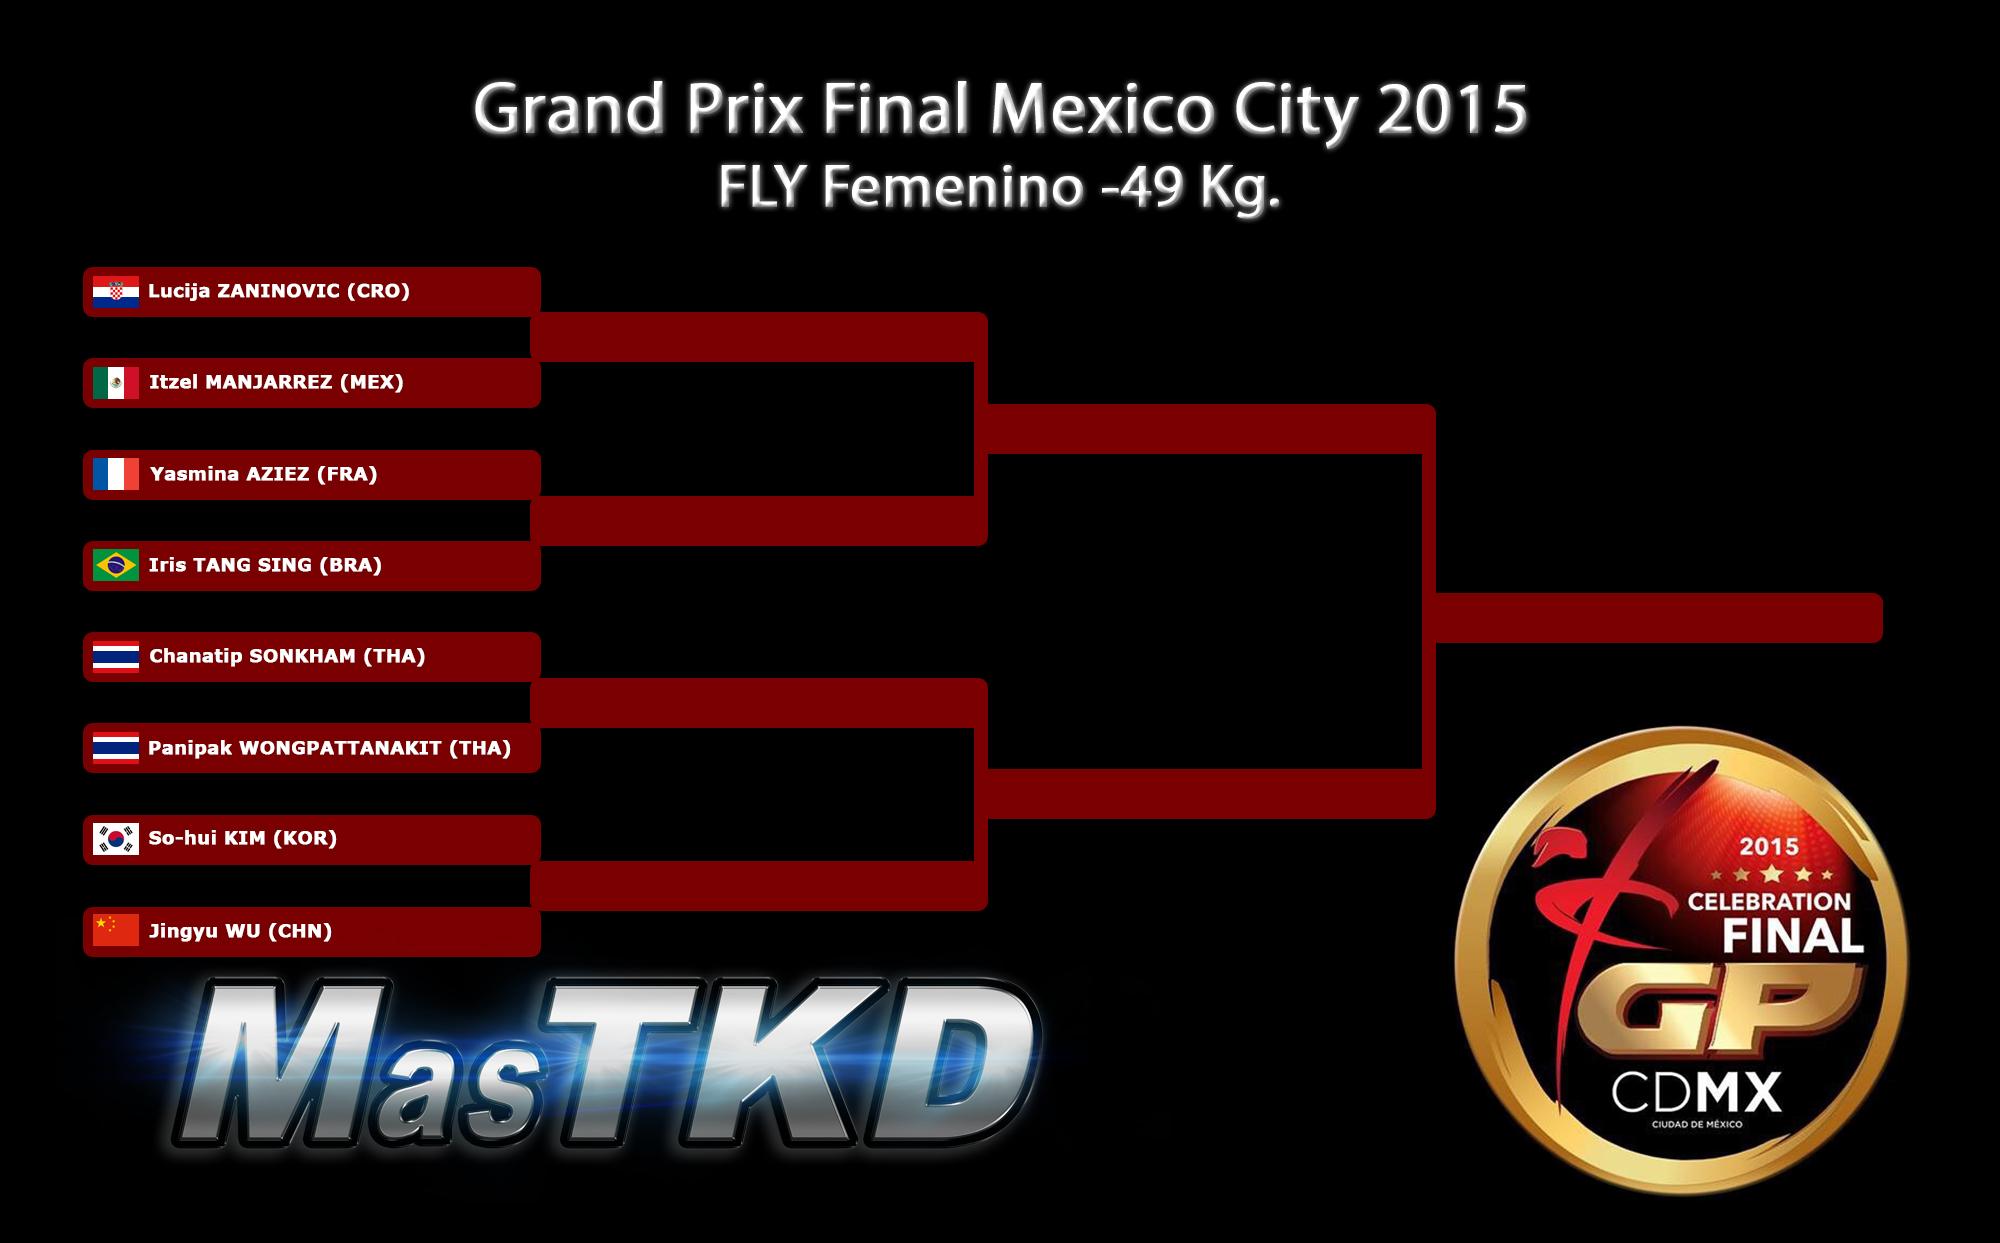 F-49_Grafica_GPFinal_MexicoCity2015